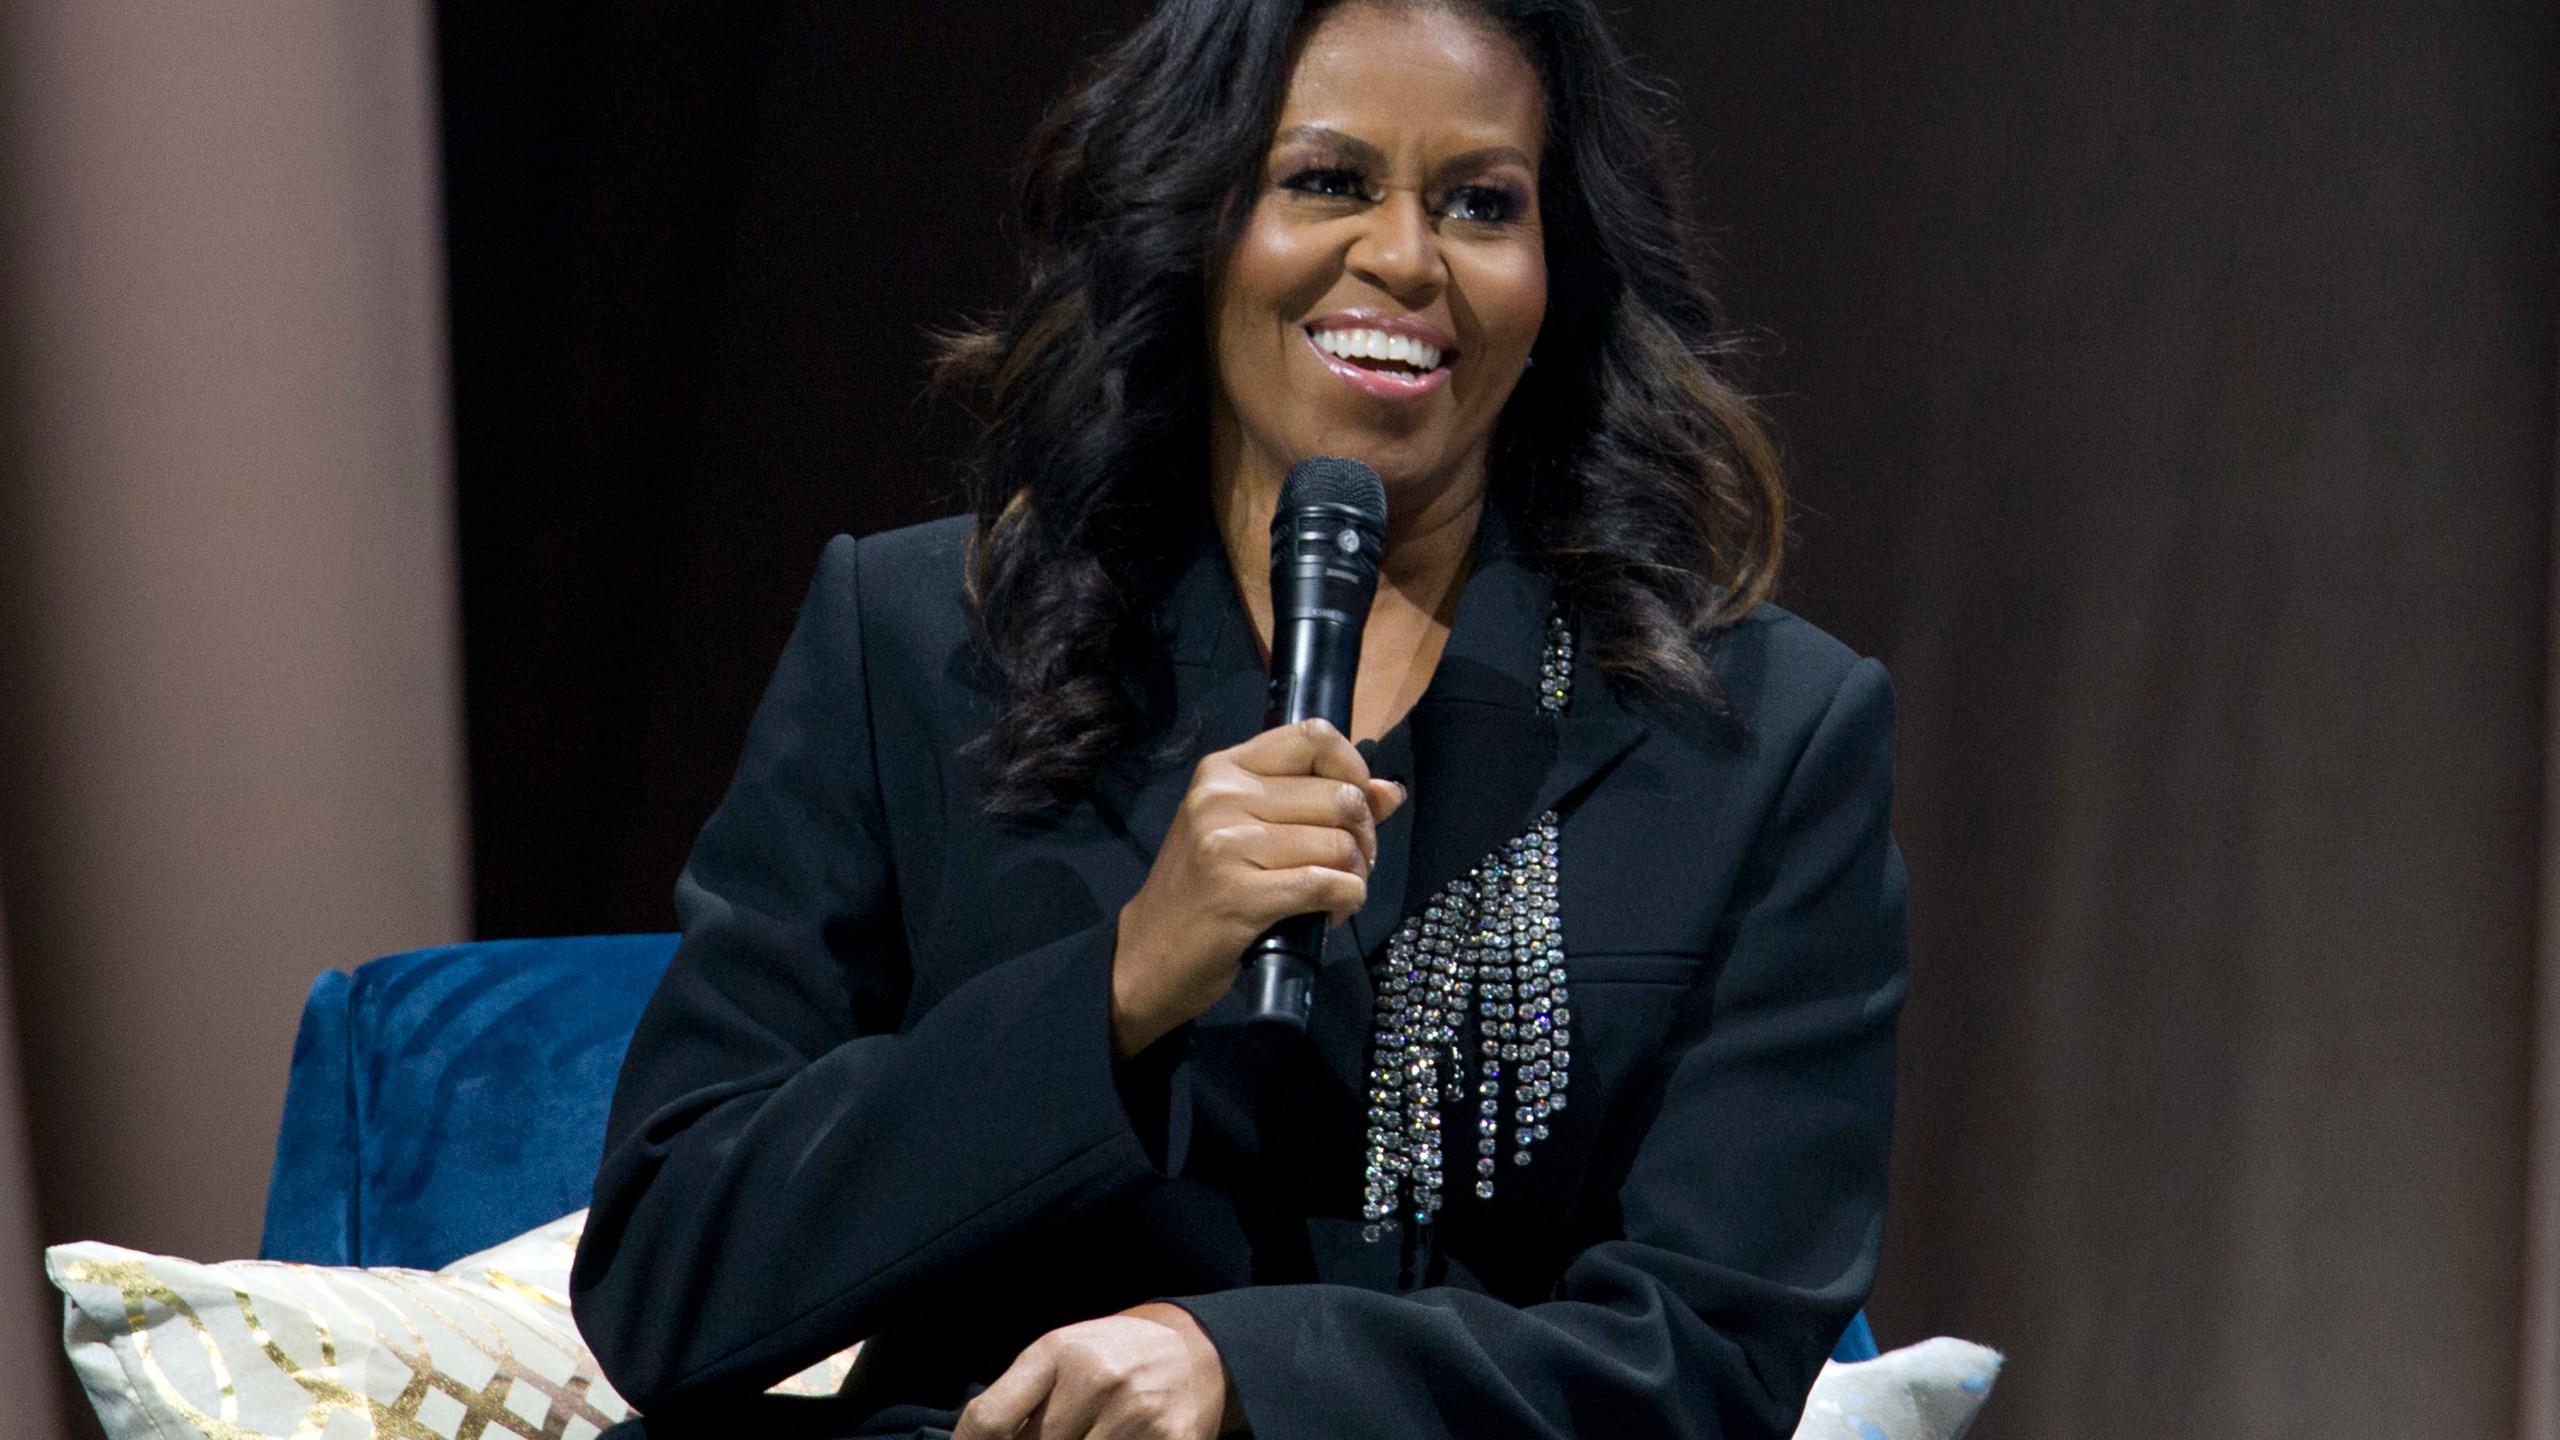 APTOPIX_Michelle_Obama_Book_Tour_55736-159532.jpg75829238